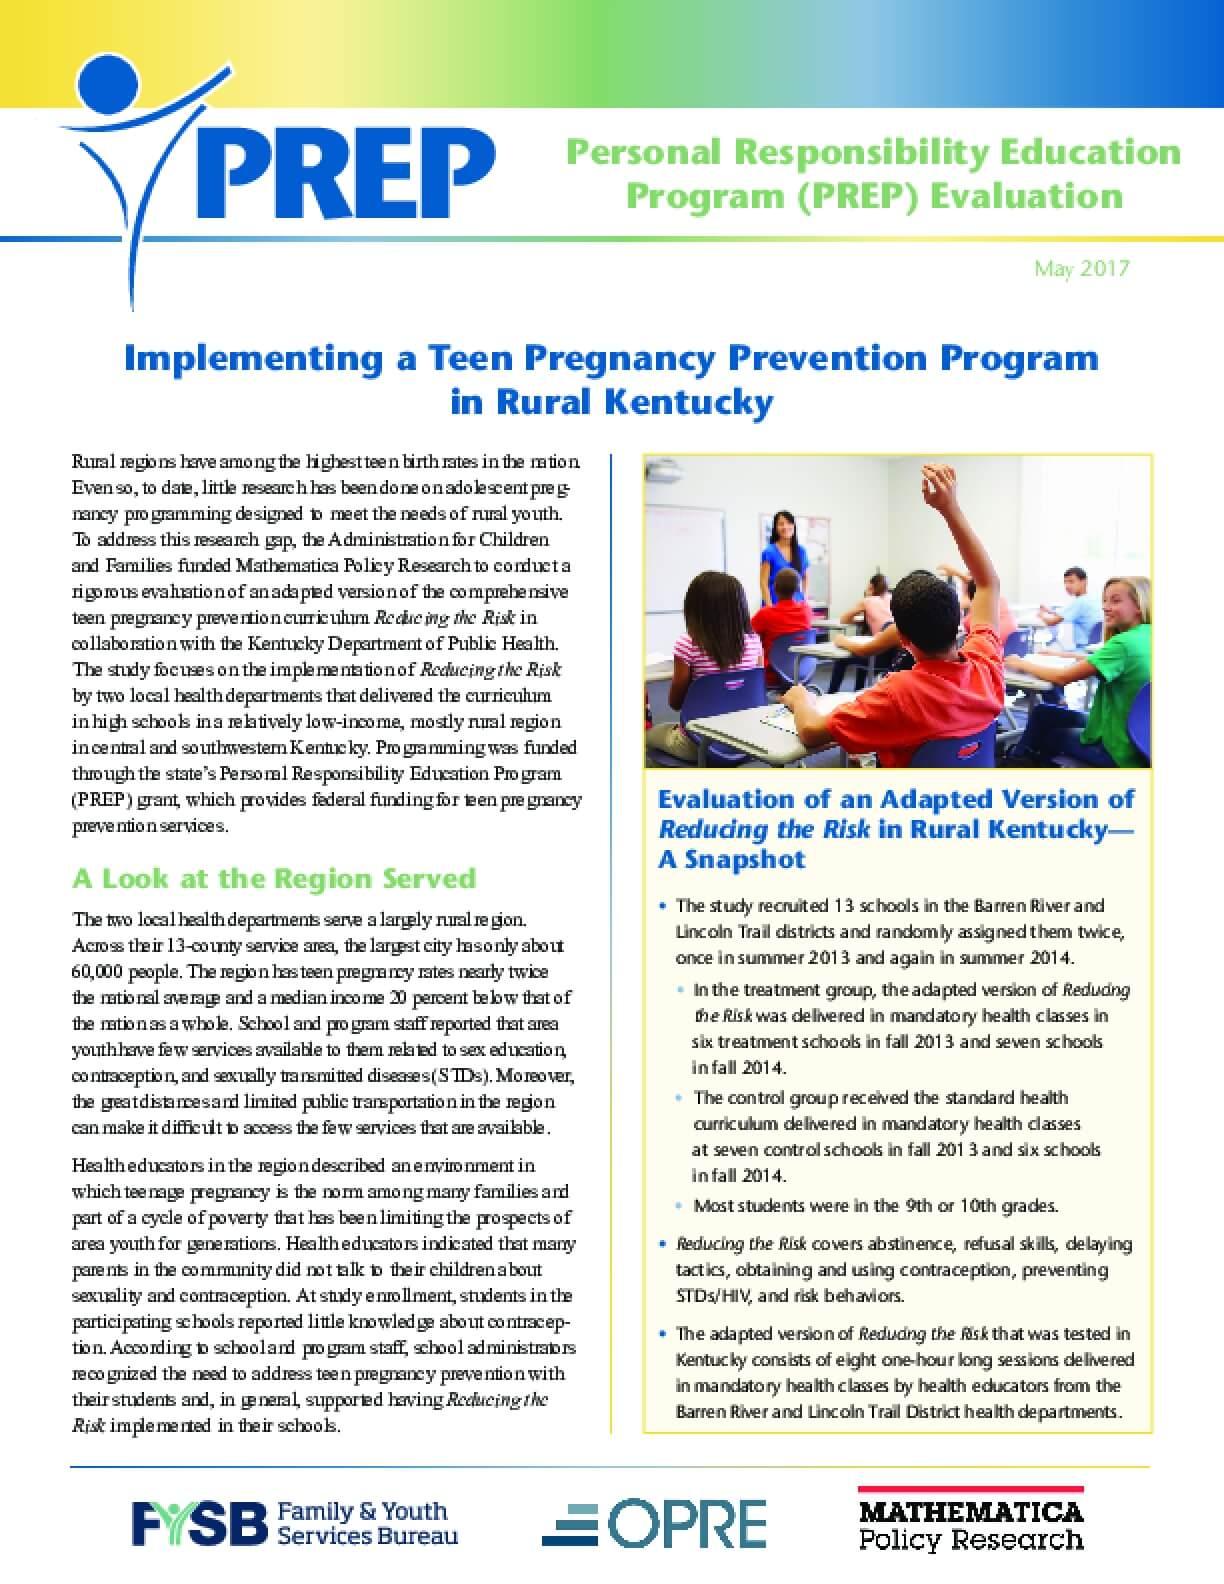 Implementing a Teen Pregnancy Prevention Program in Rural Kentucky